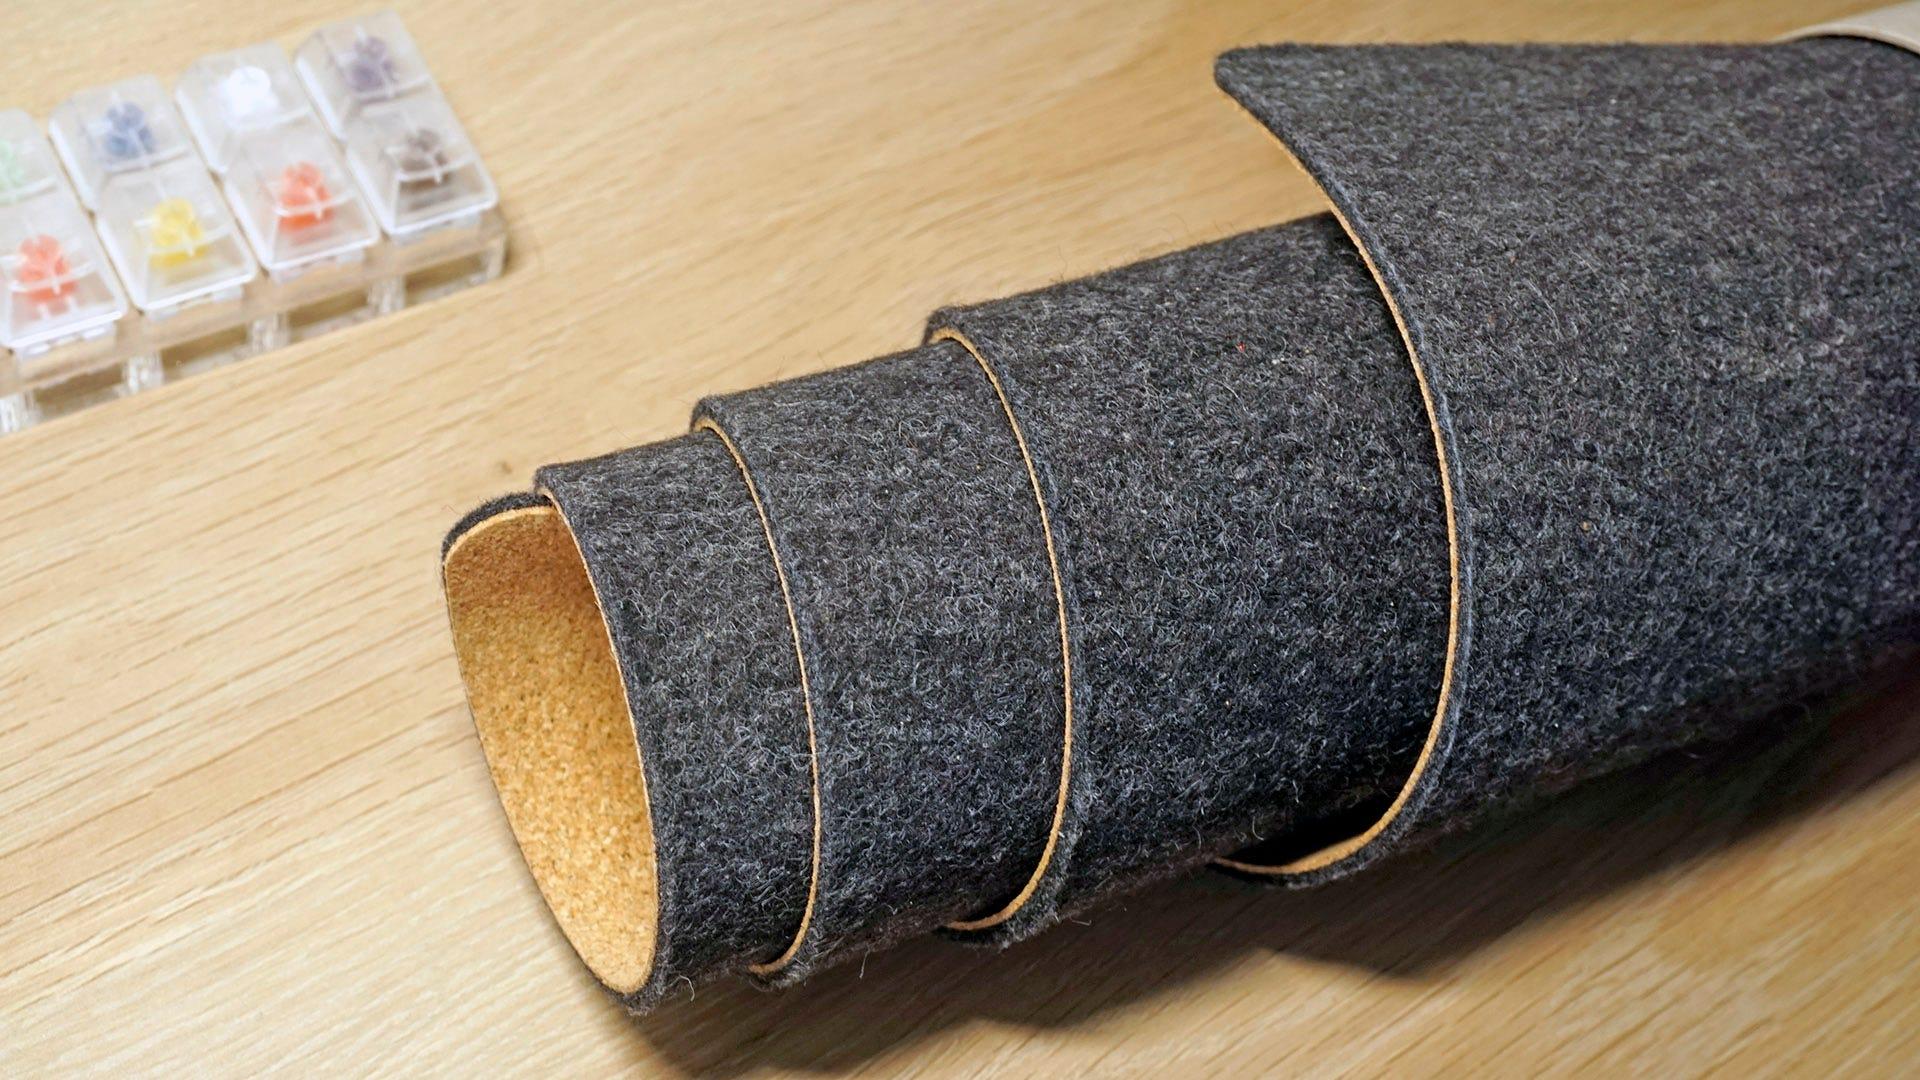 Oakywood felt desk mat rolled up